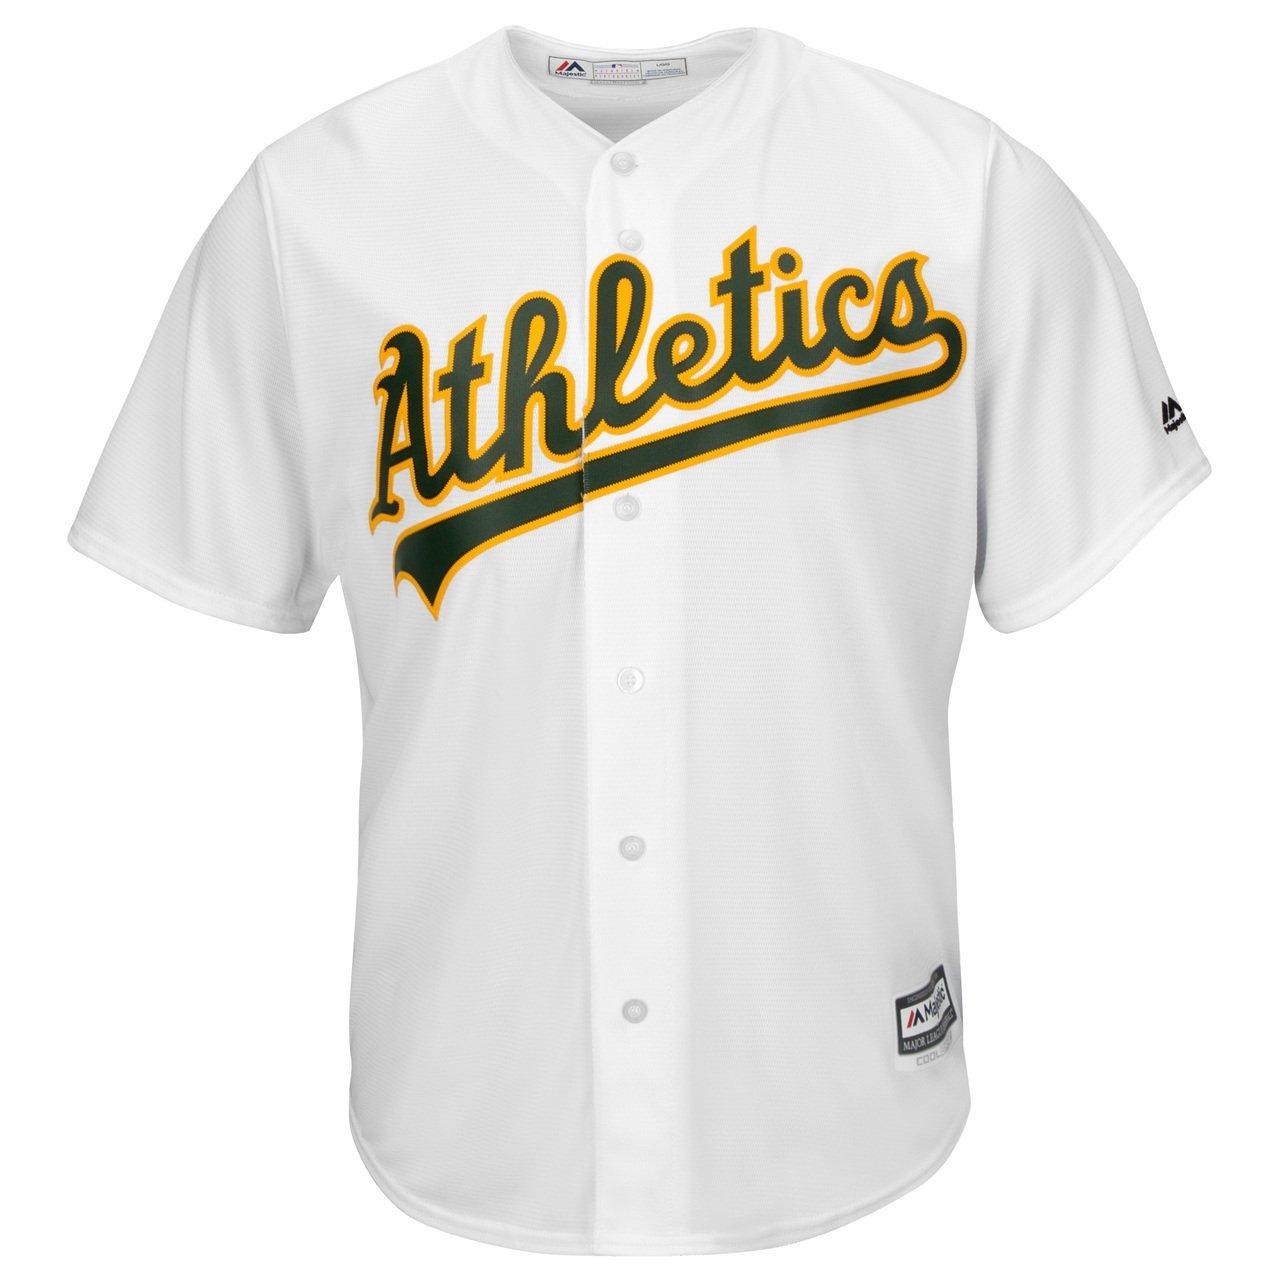 Sports Amazon amp; Majestic Jersey White Oakland Outdoors Mlb Women's Athletics com 2015 Cool Home Base